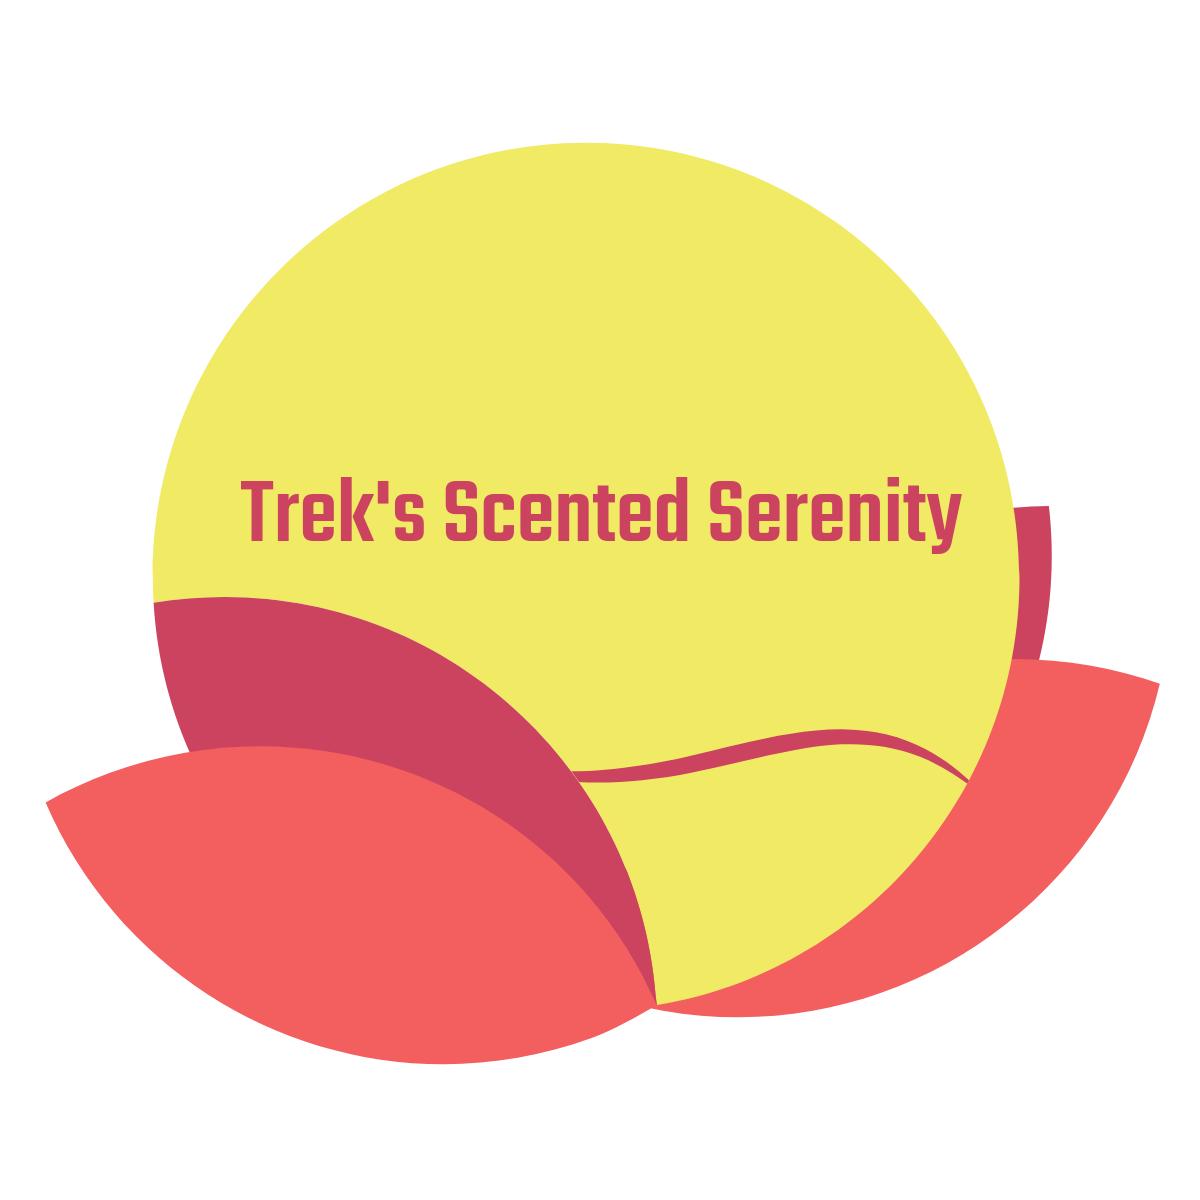 Trek's Scented Serenity image